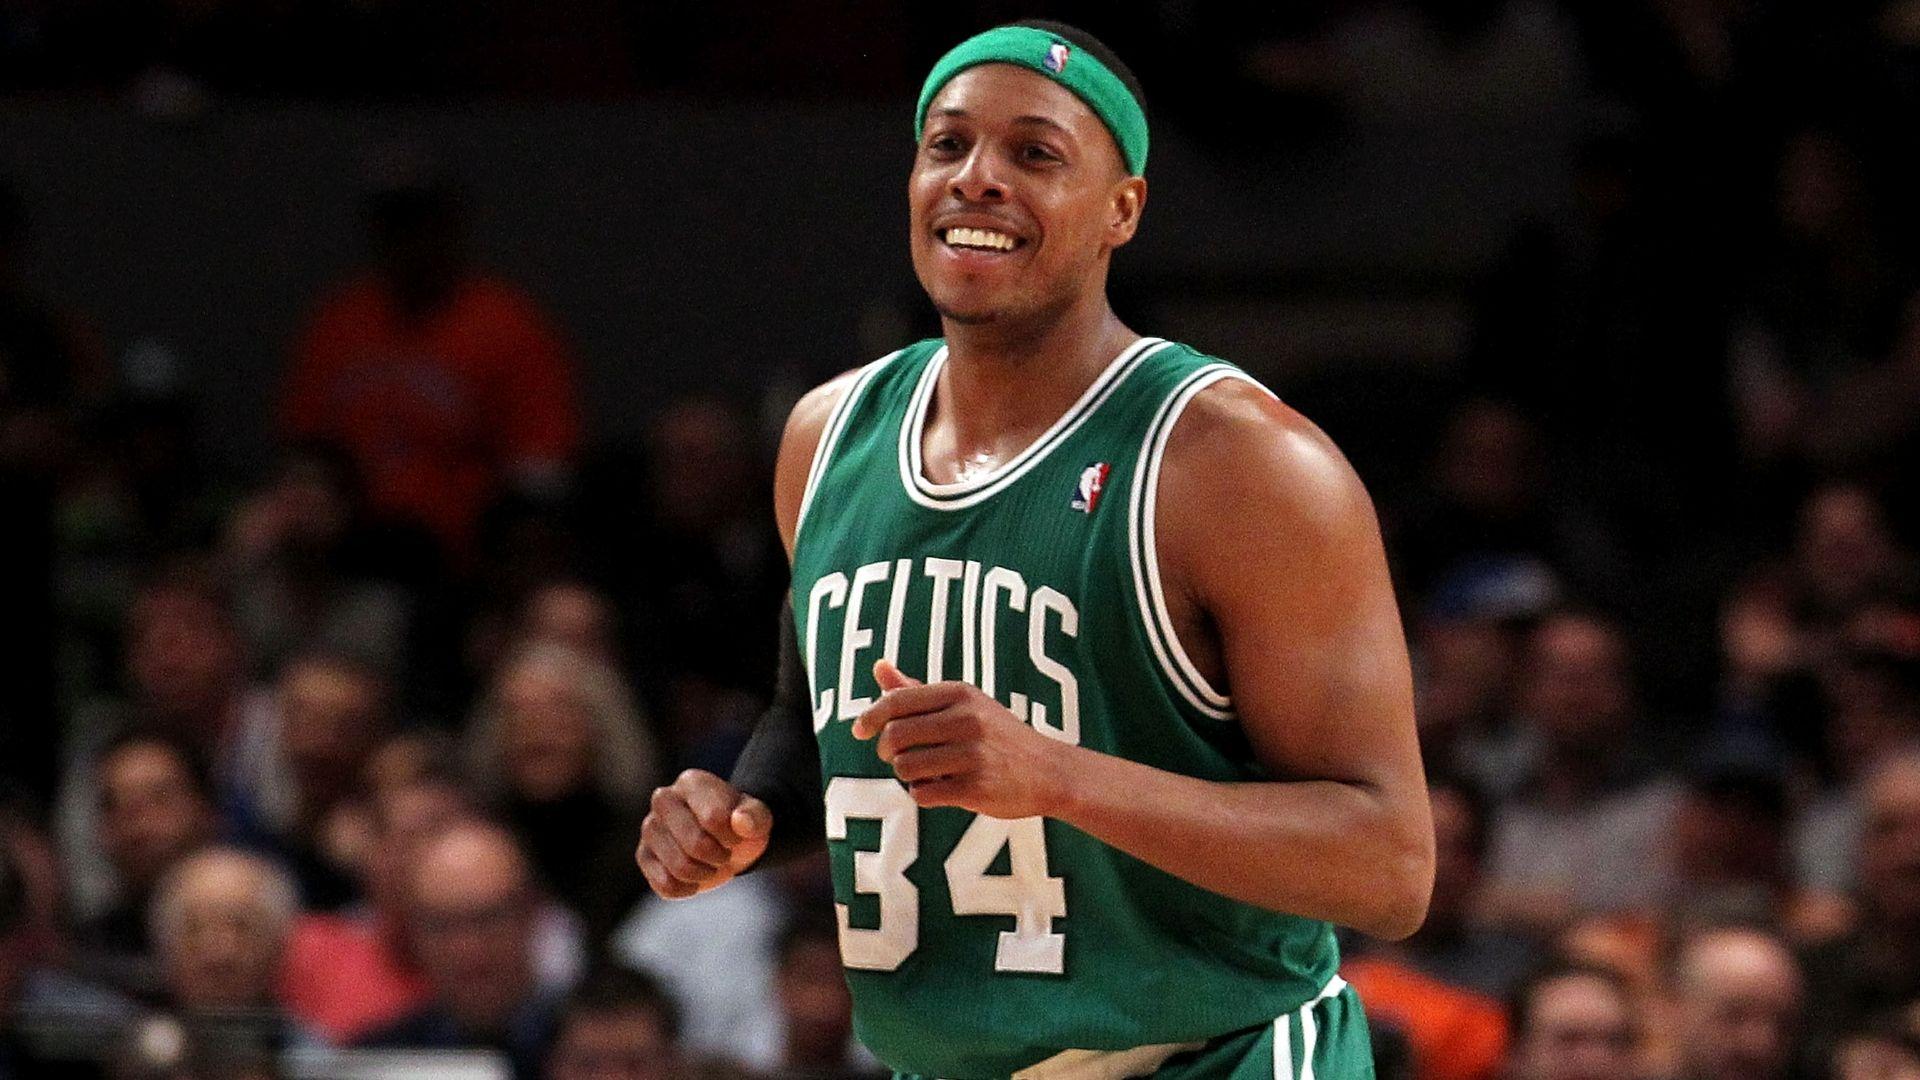 Paul Pierce's greatest moments with the Celtics - ESPN Video